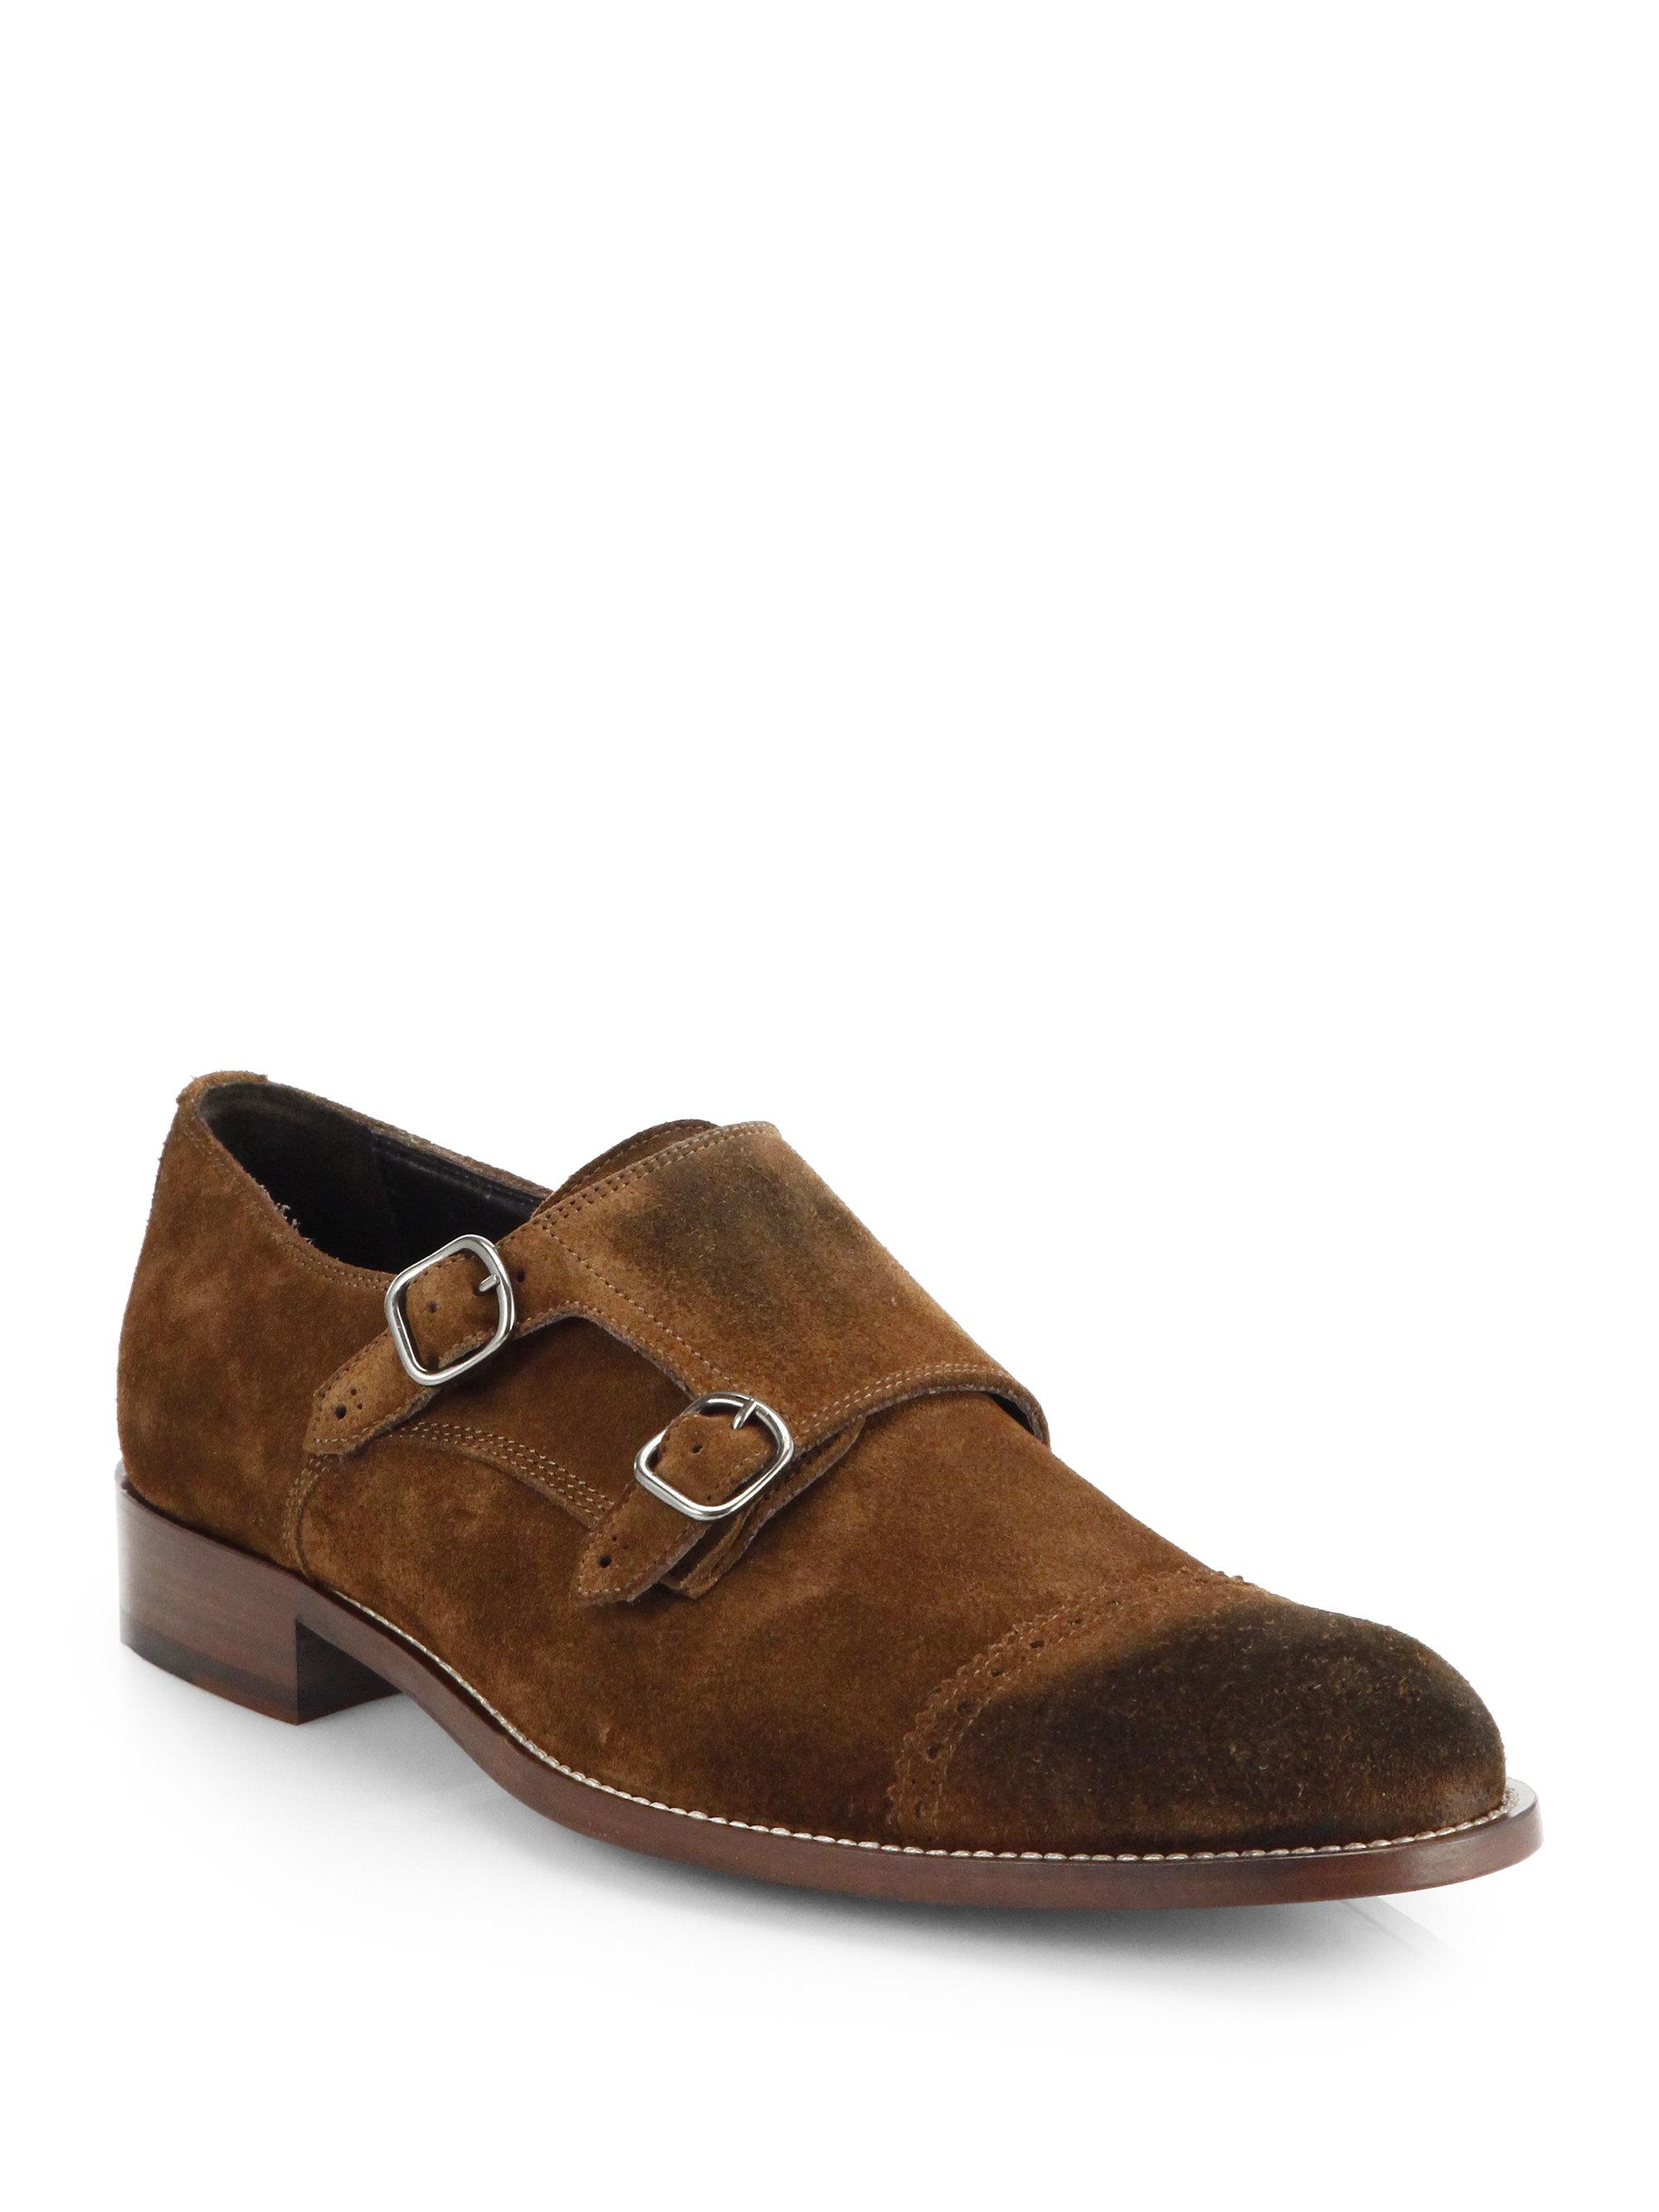 Bally Mens Suede Monkstrap Shoes